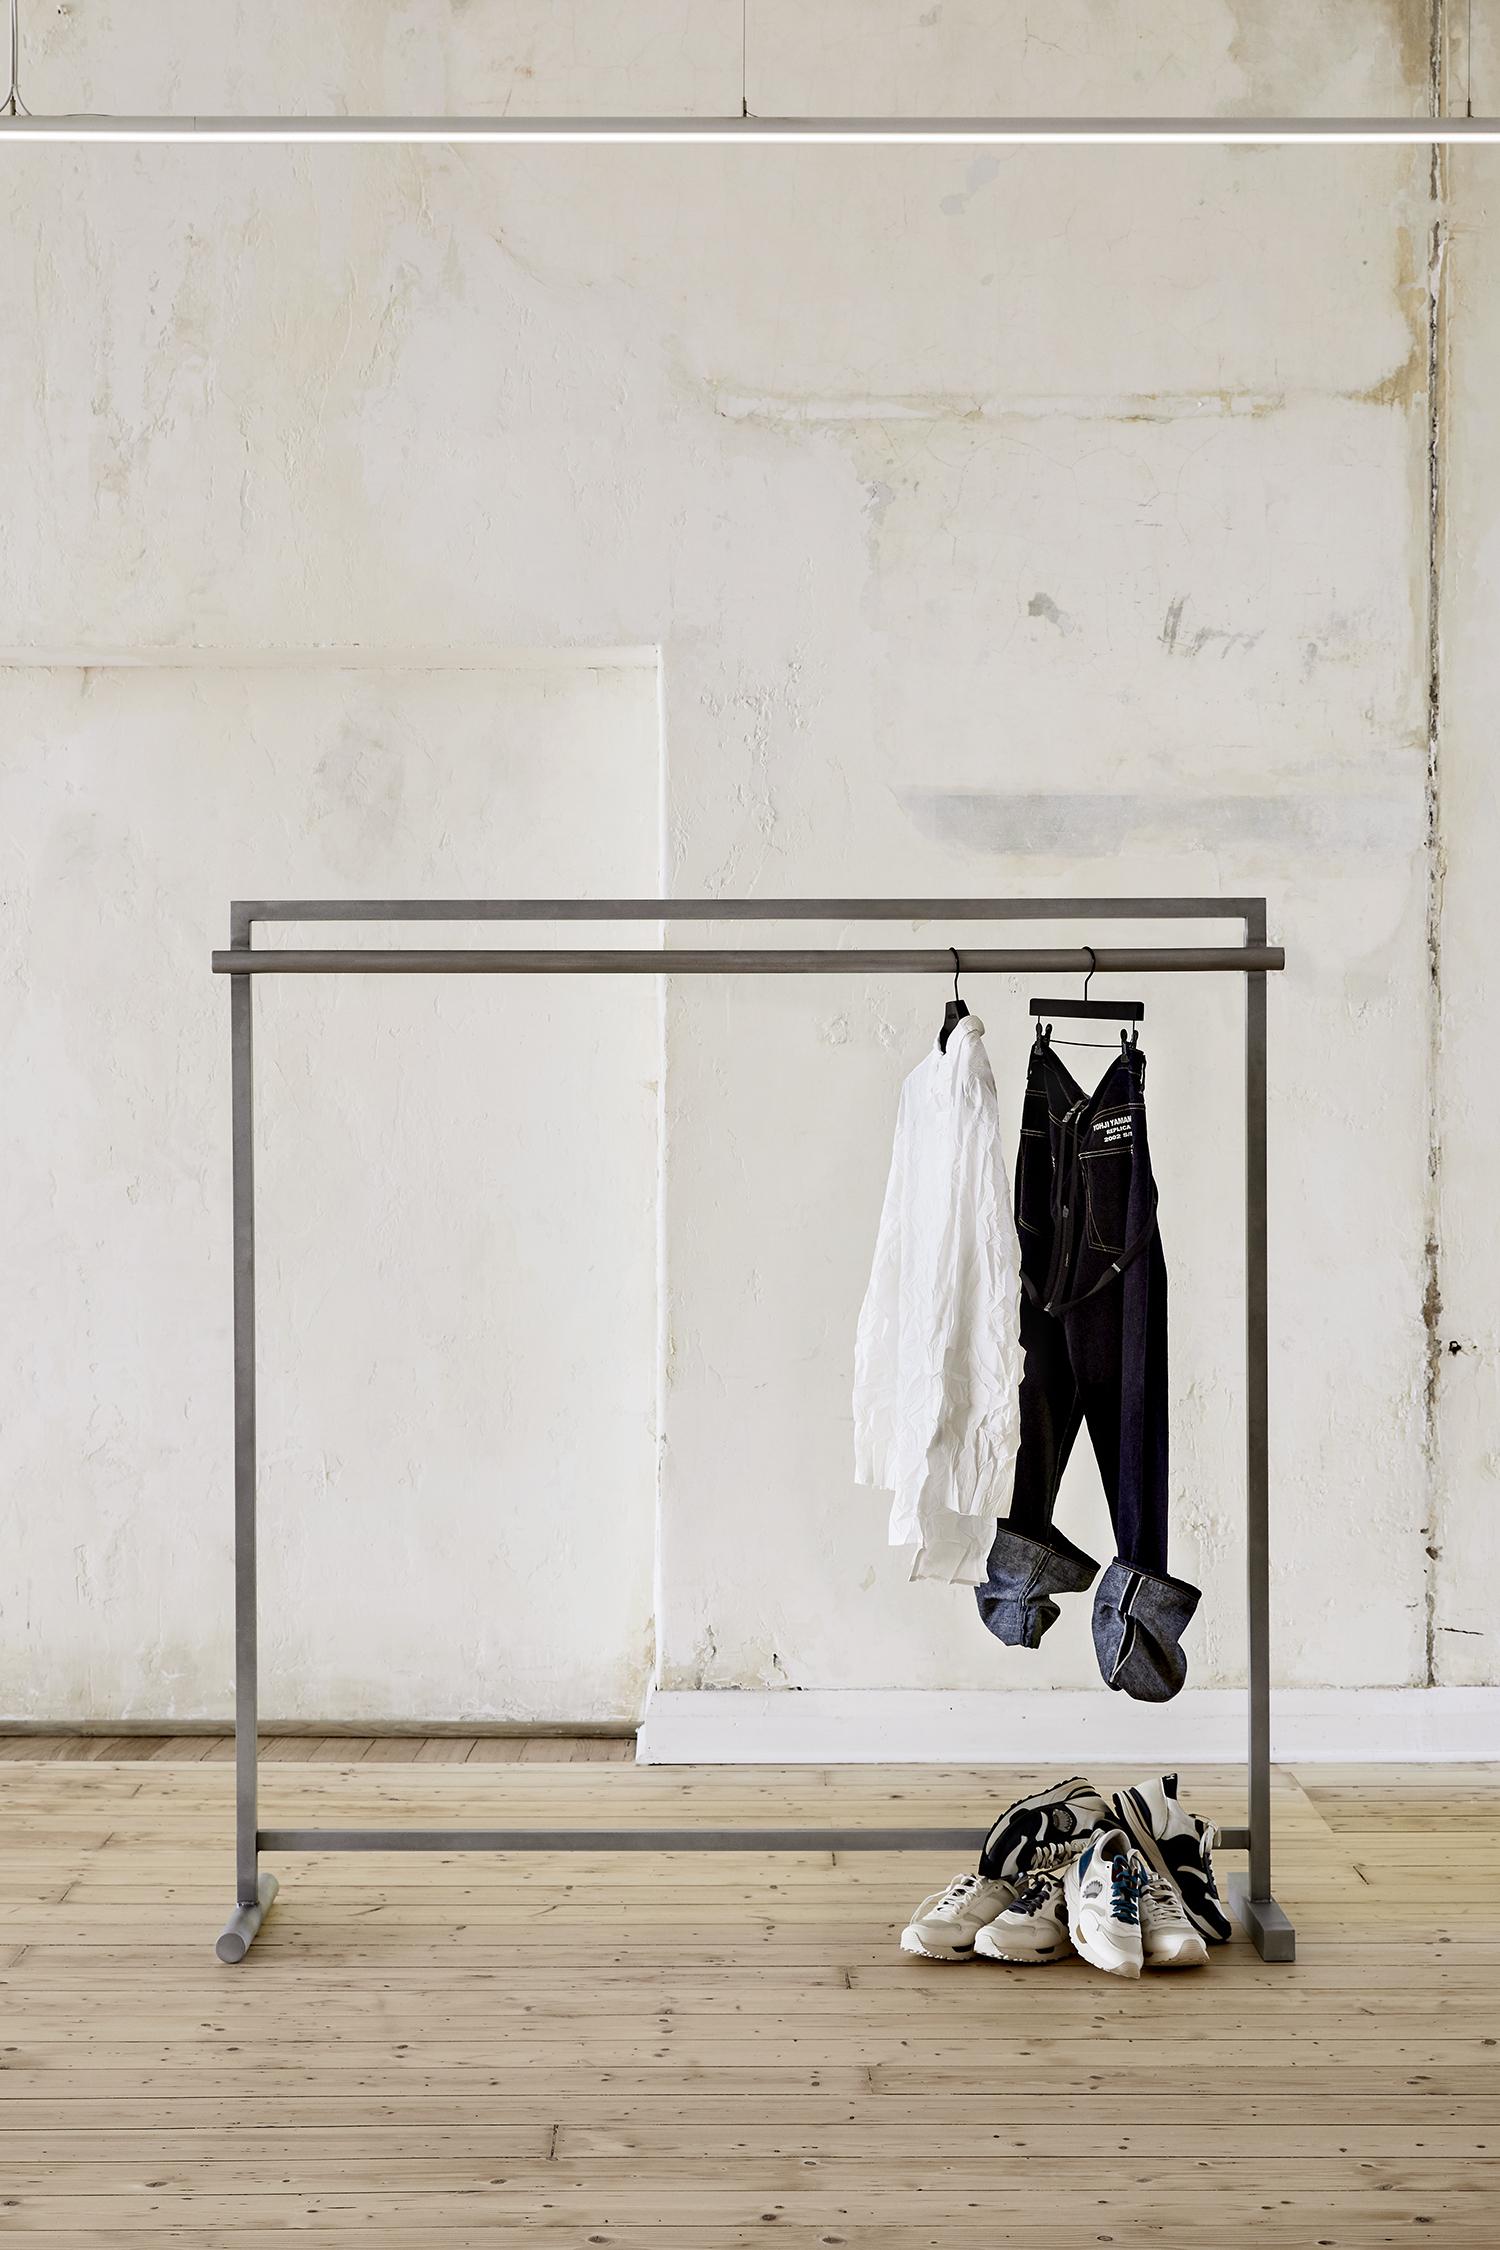 NO 3 Our Clothes Rack03